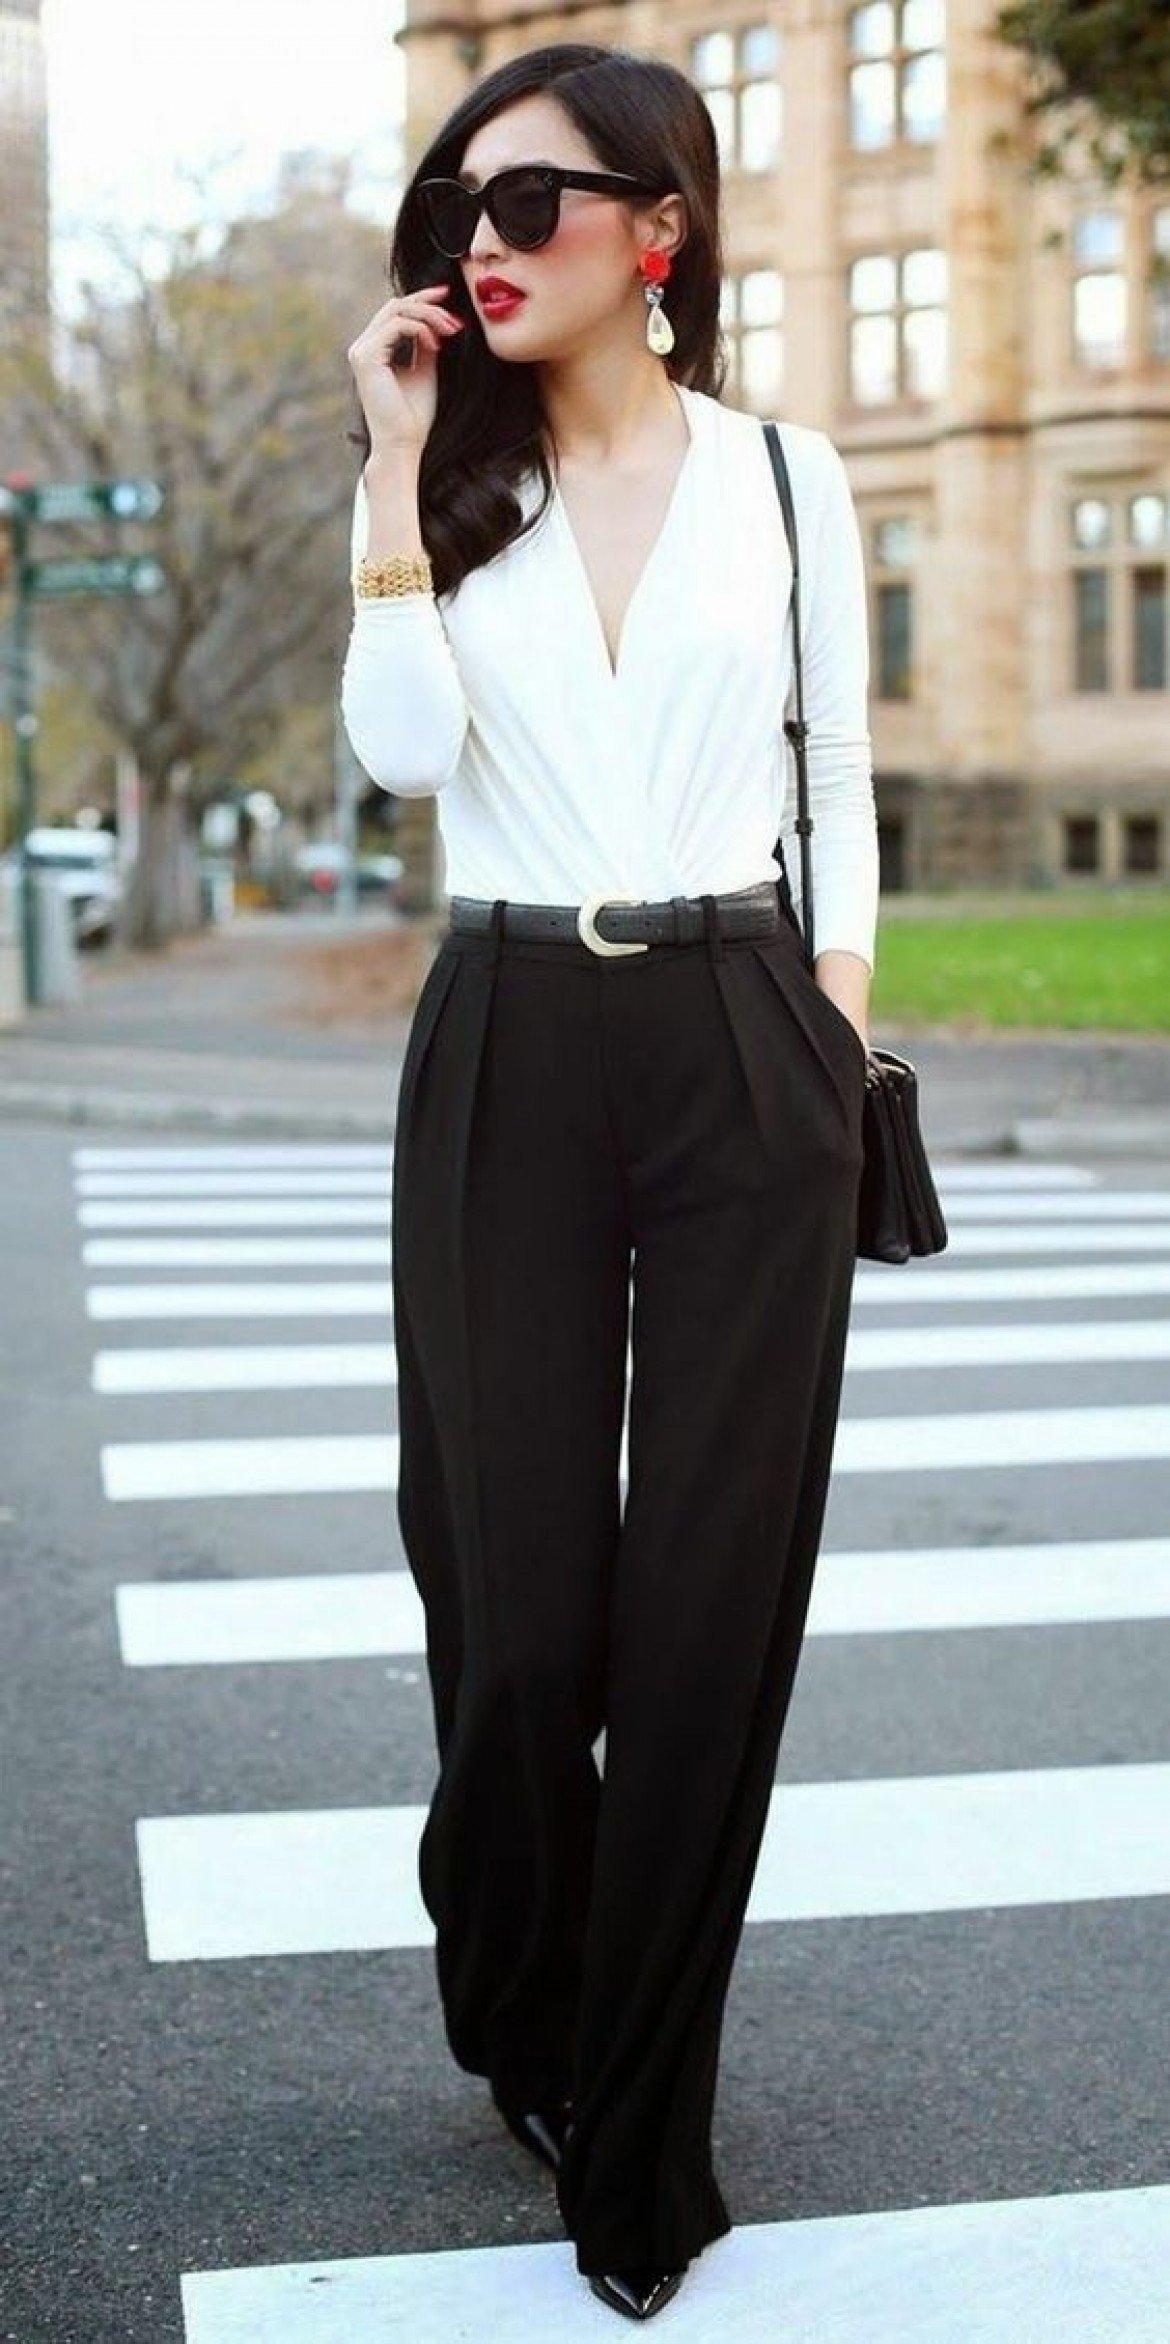 20 Que Ir De Para Trabajo Outfits Al Podrás Usar Ideas USpMGqzV